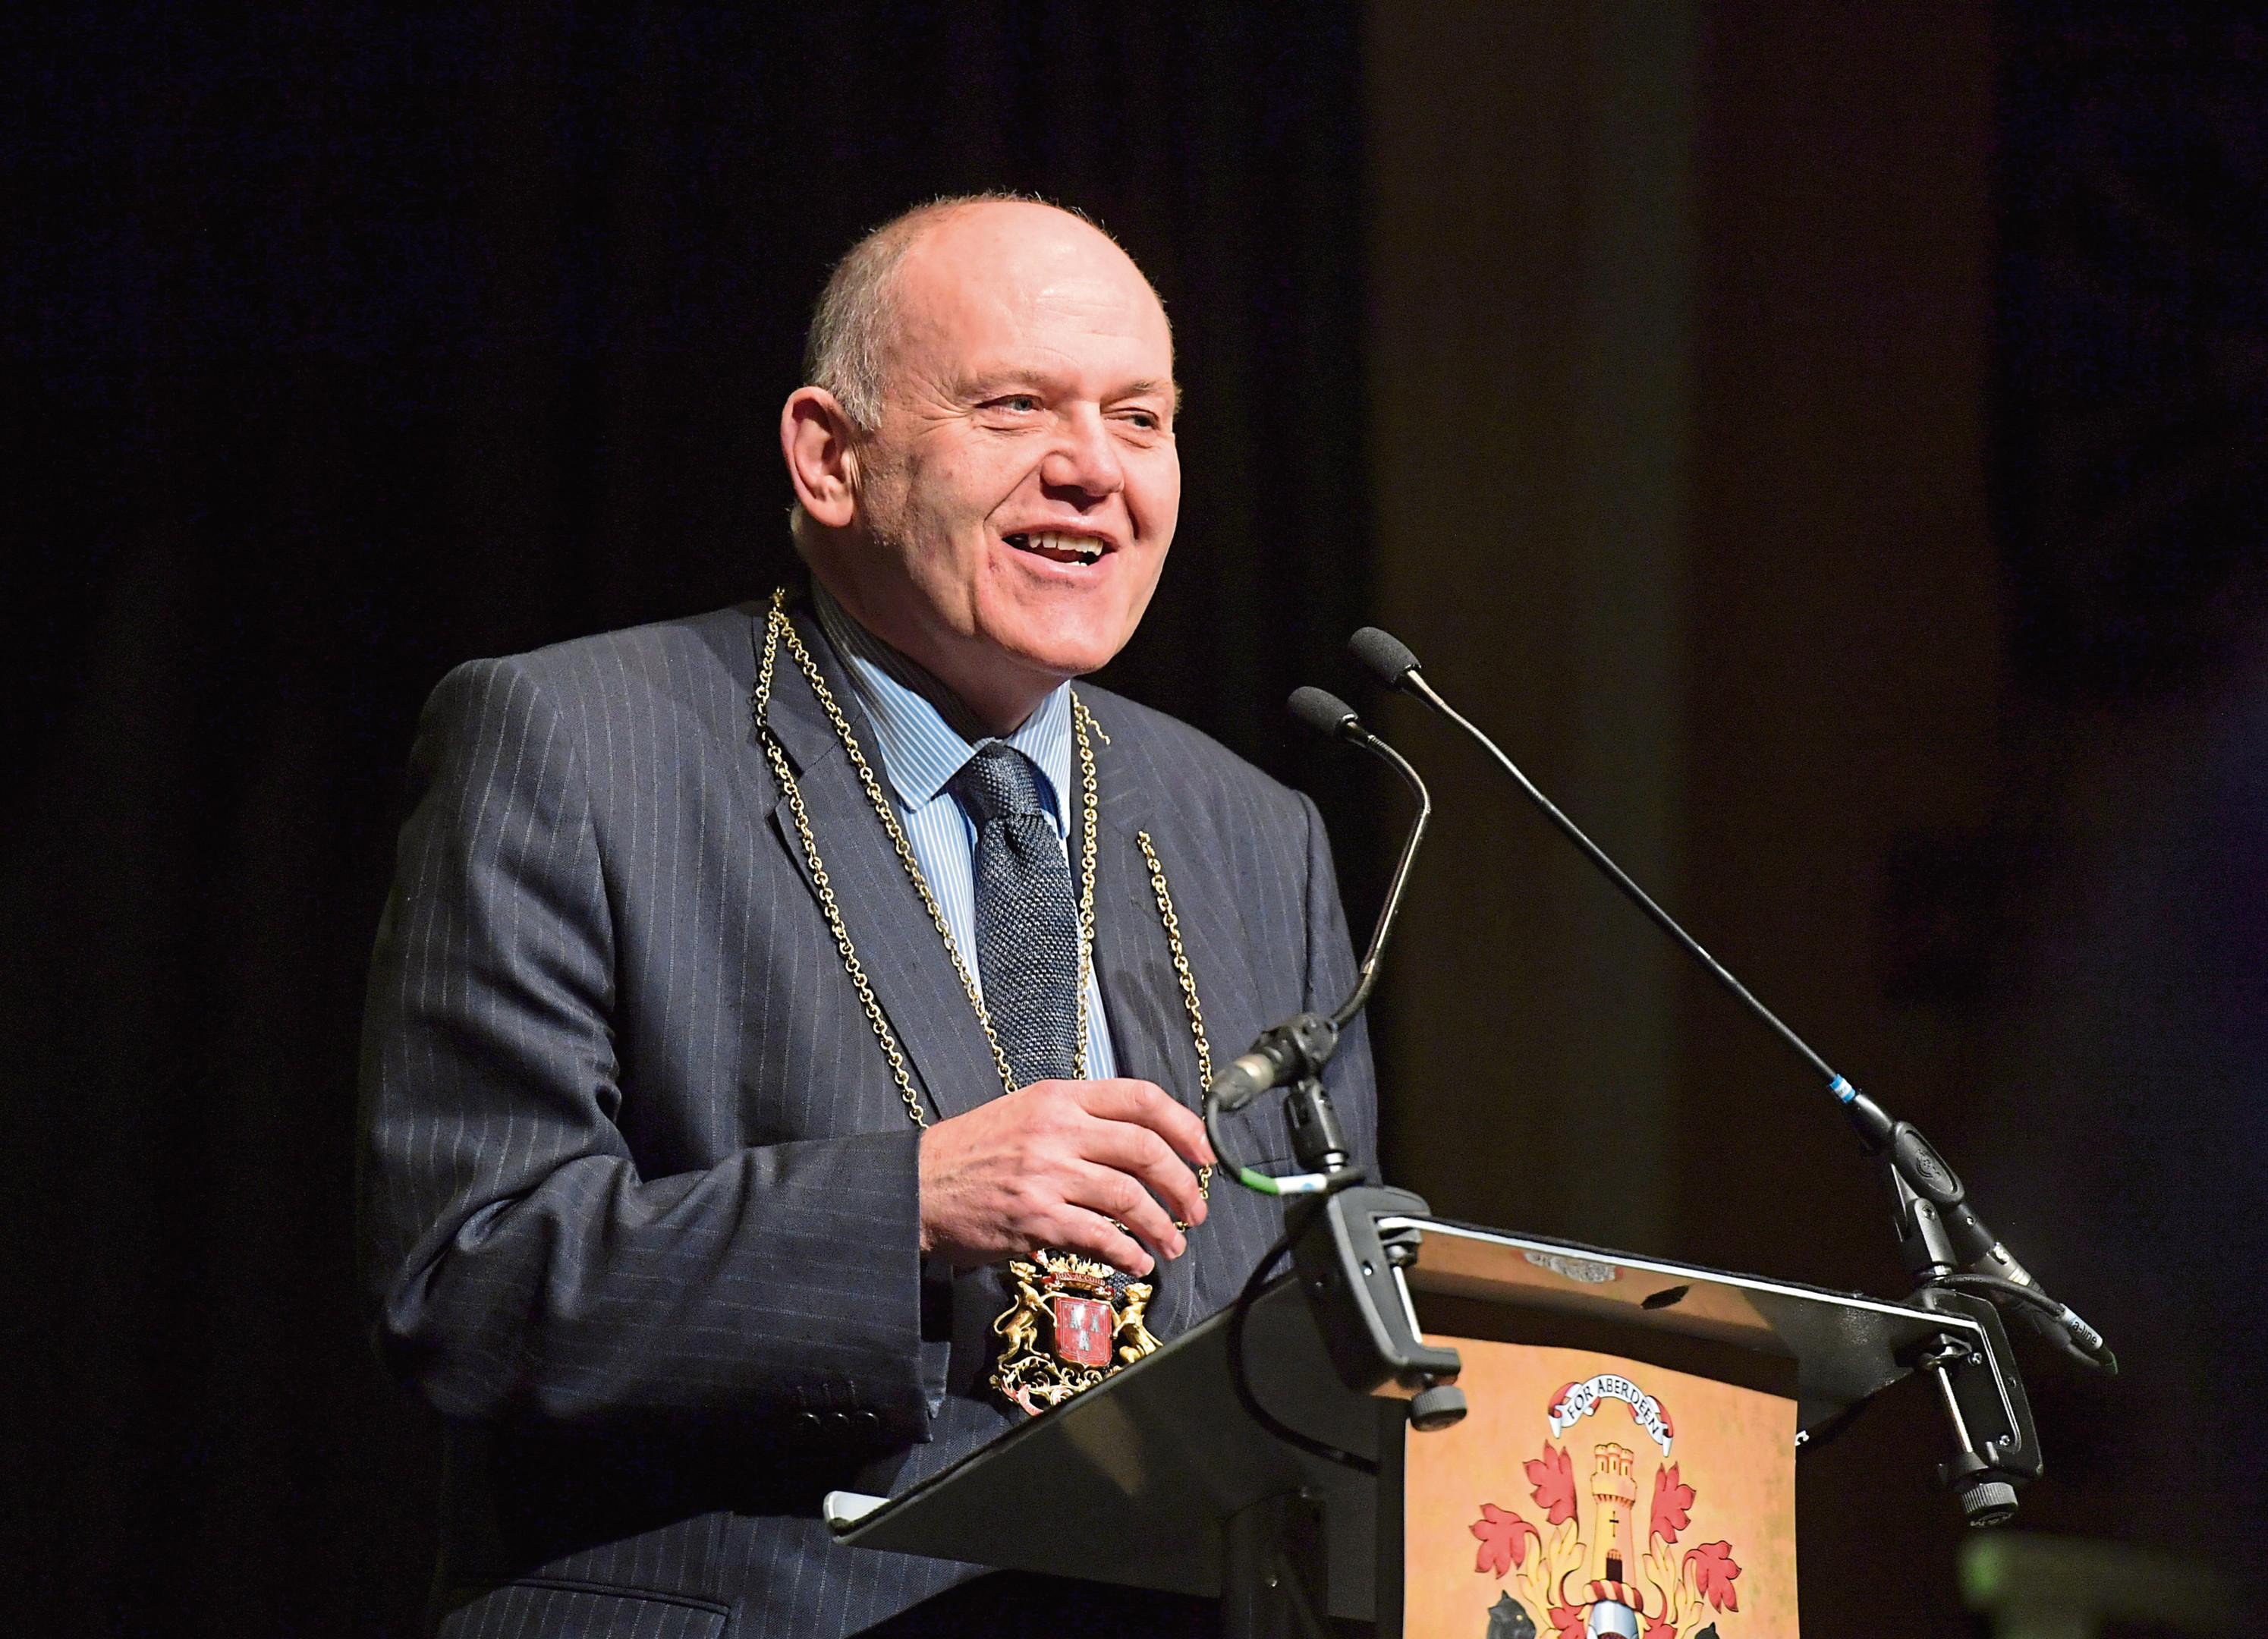 Lord Provost Barney Crockett